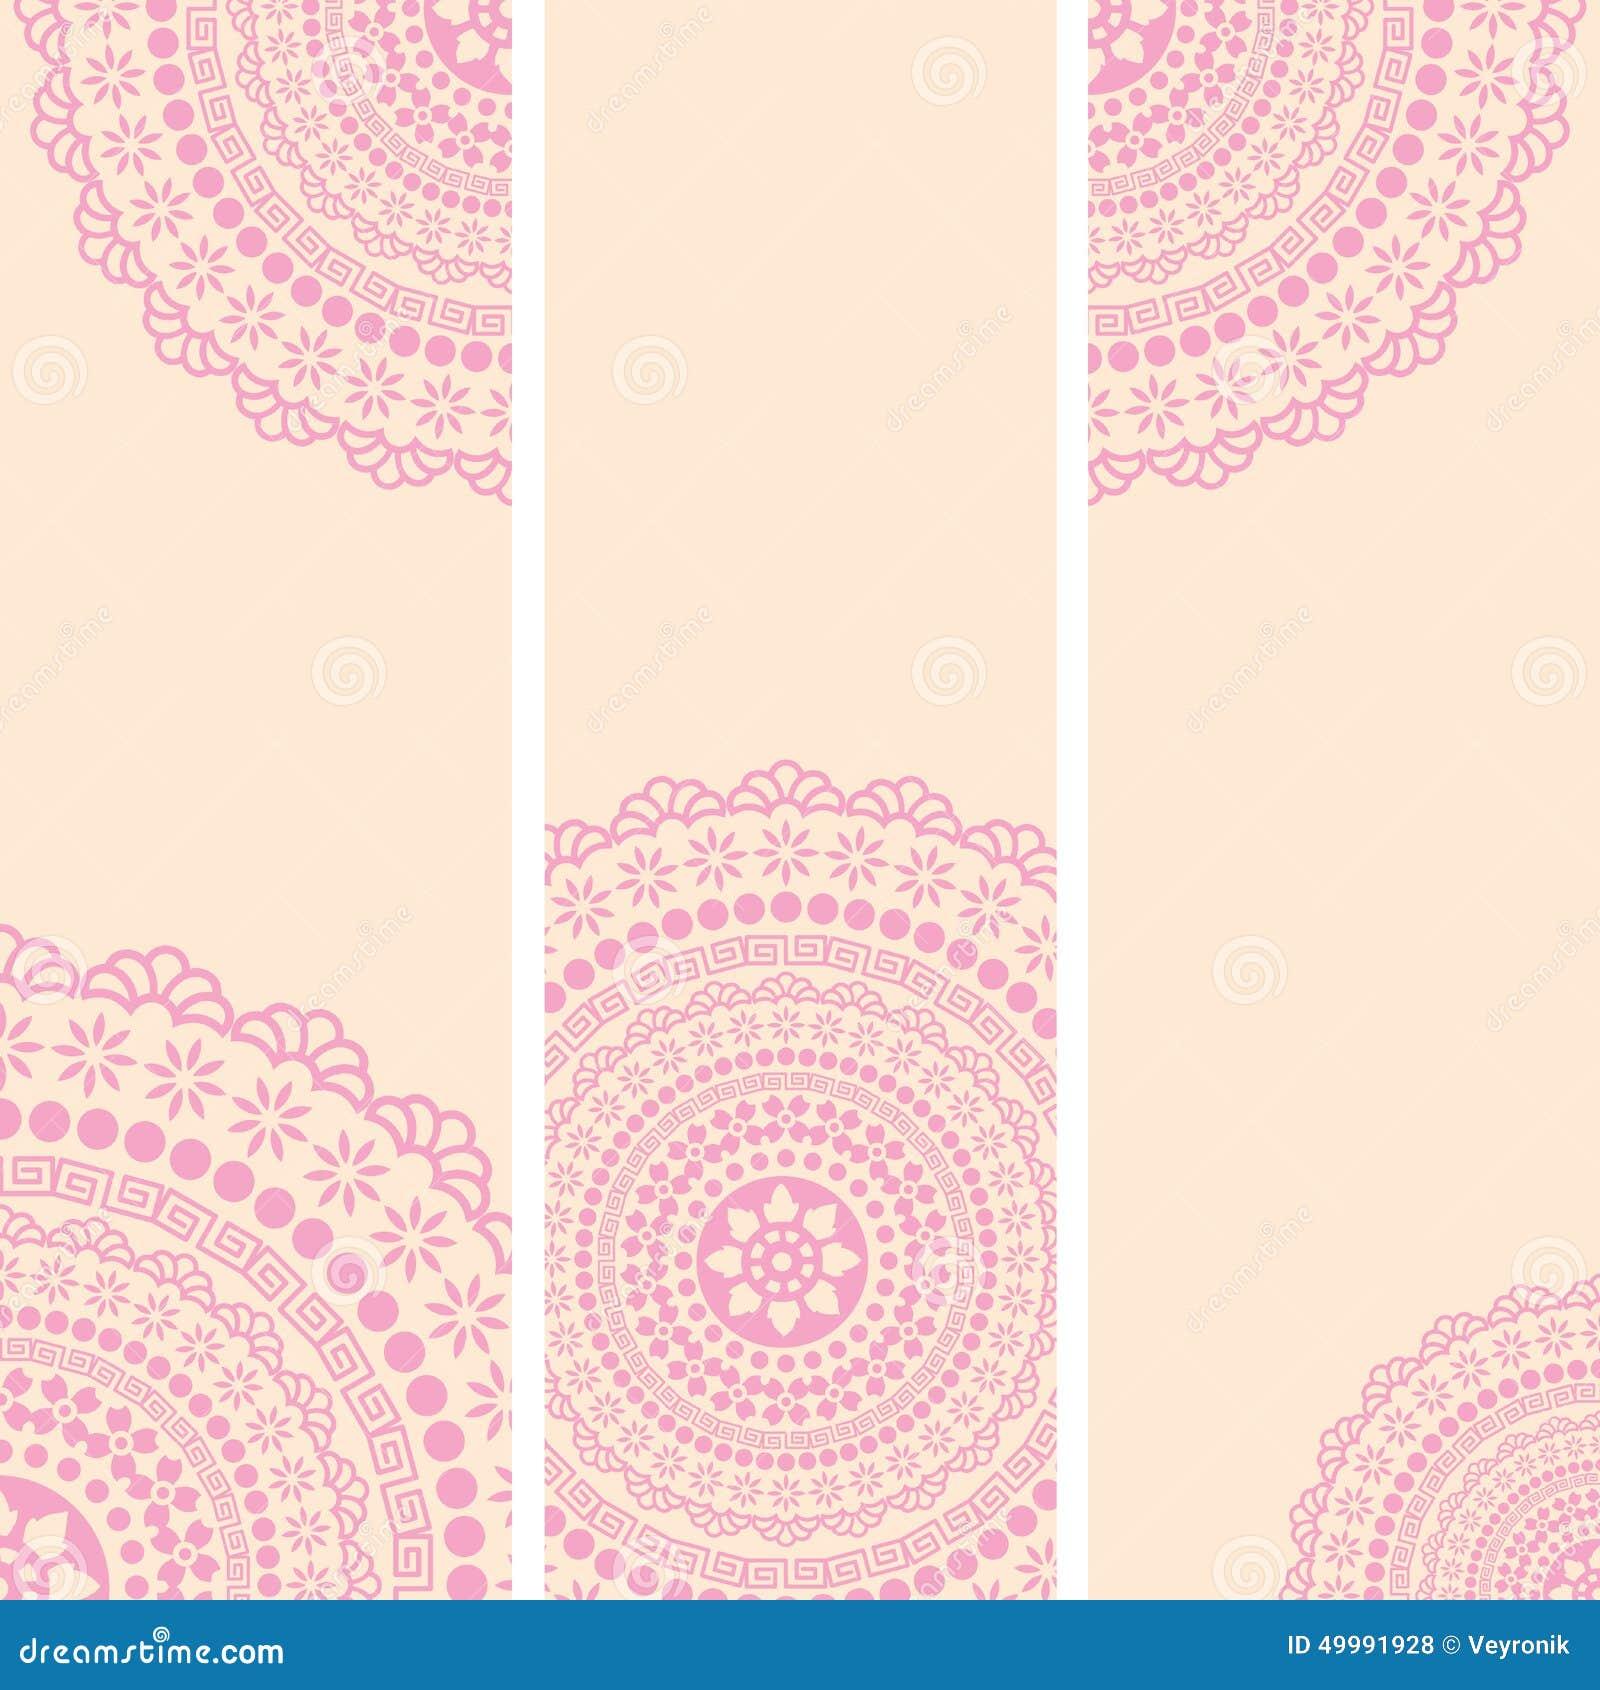 Free ornamental mandala vector download free vector art stock - Pink And Cream Oriental Mandala Vertical Banners Stock